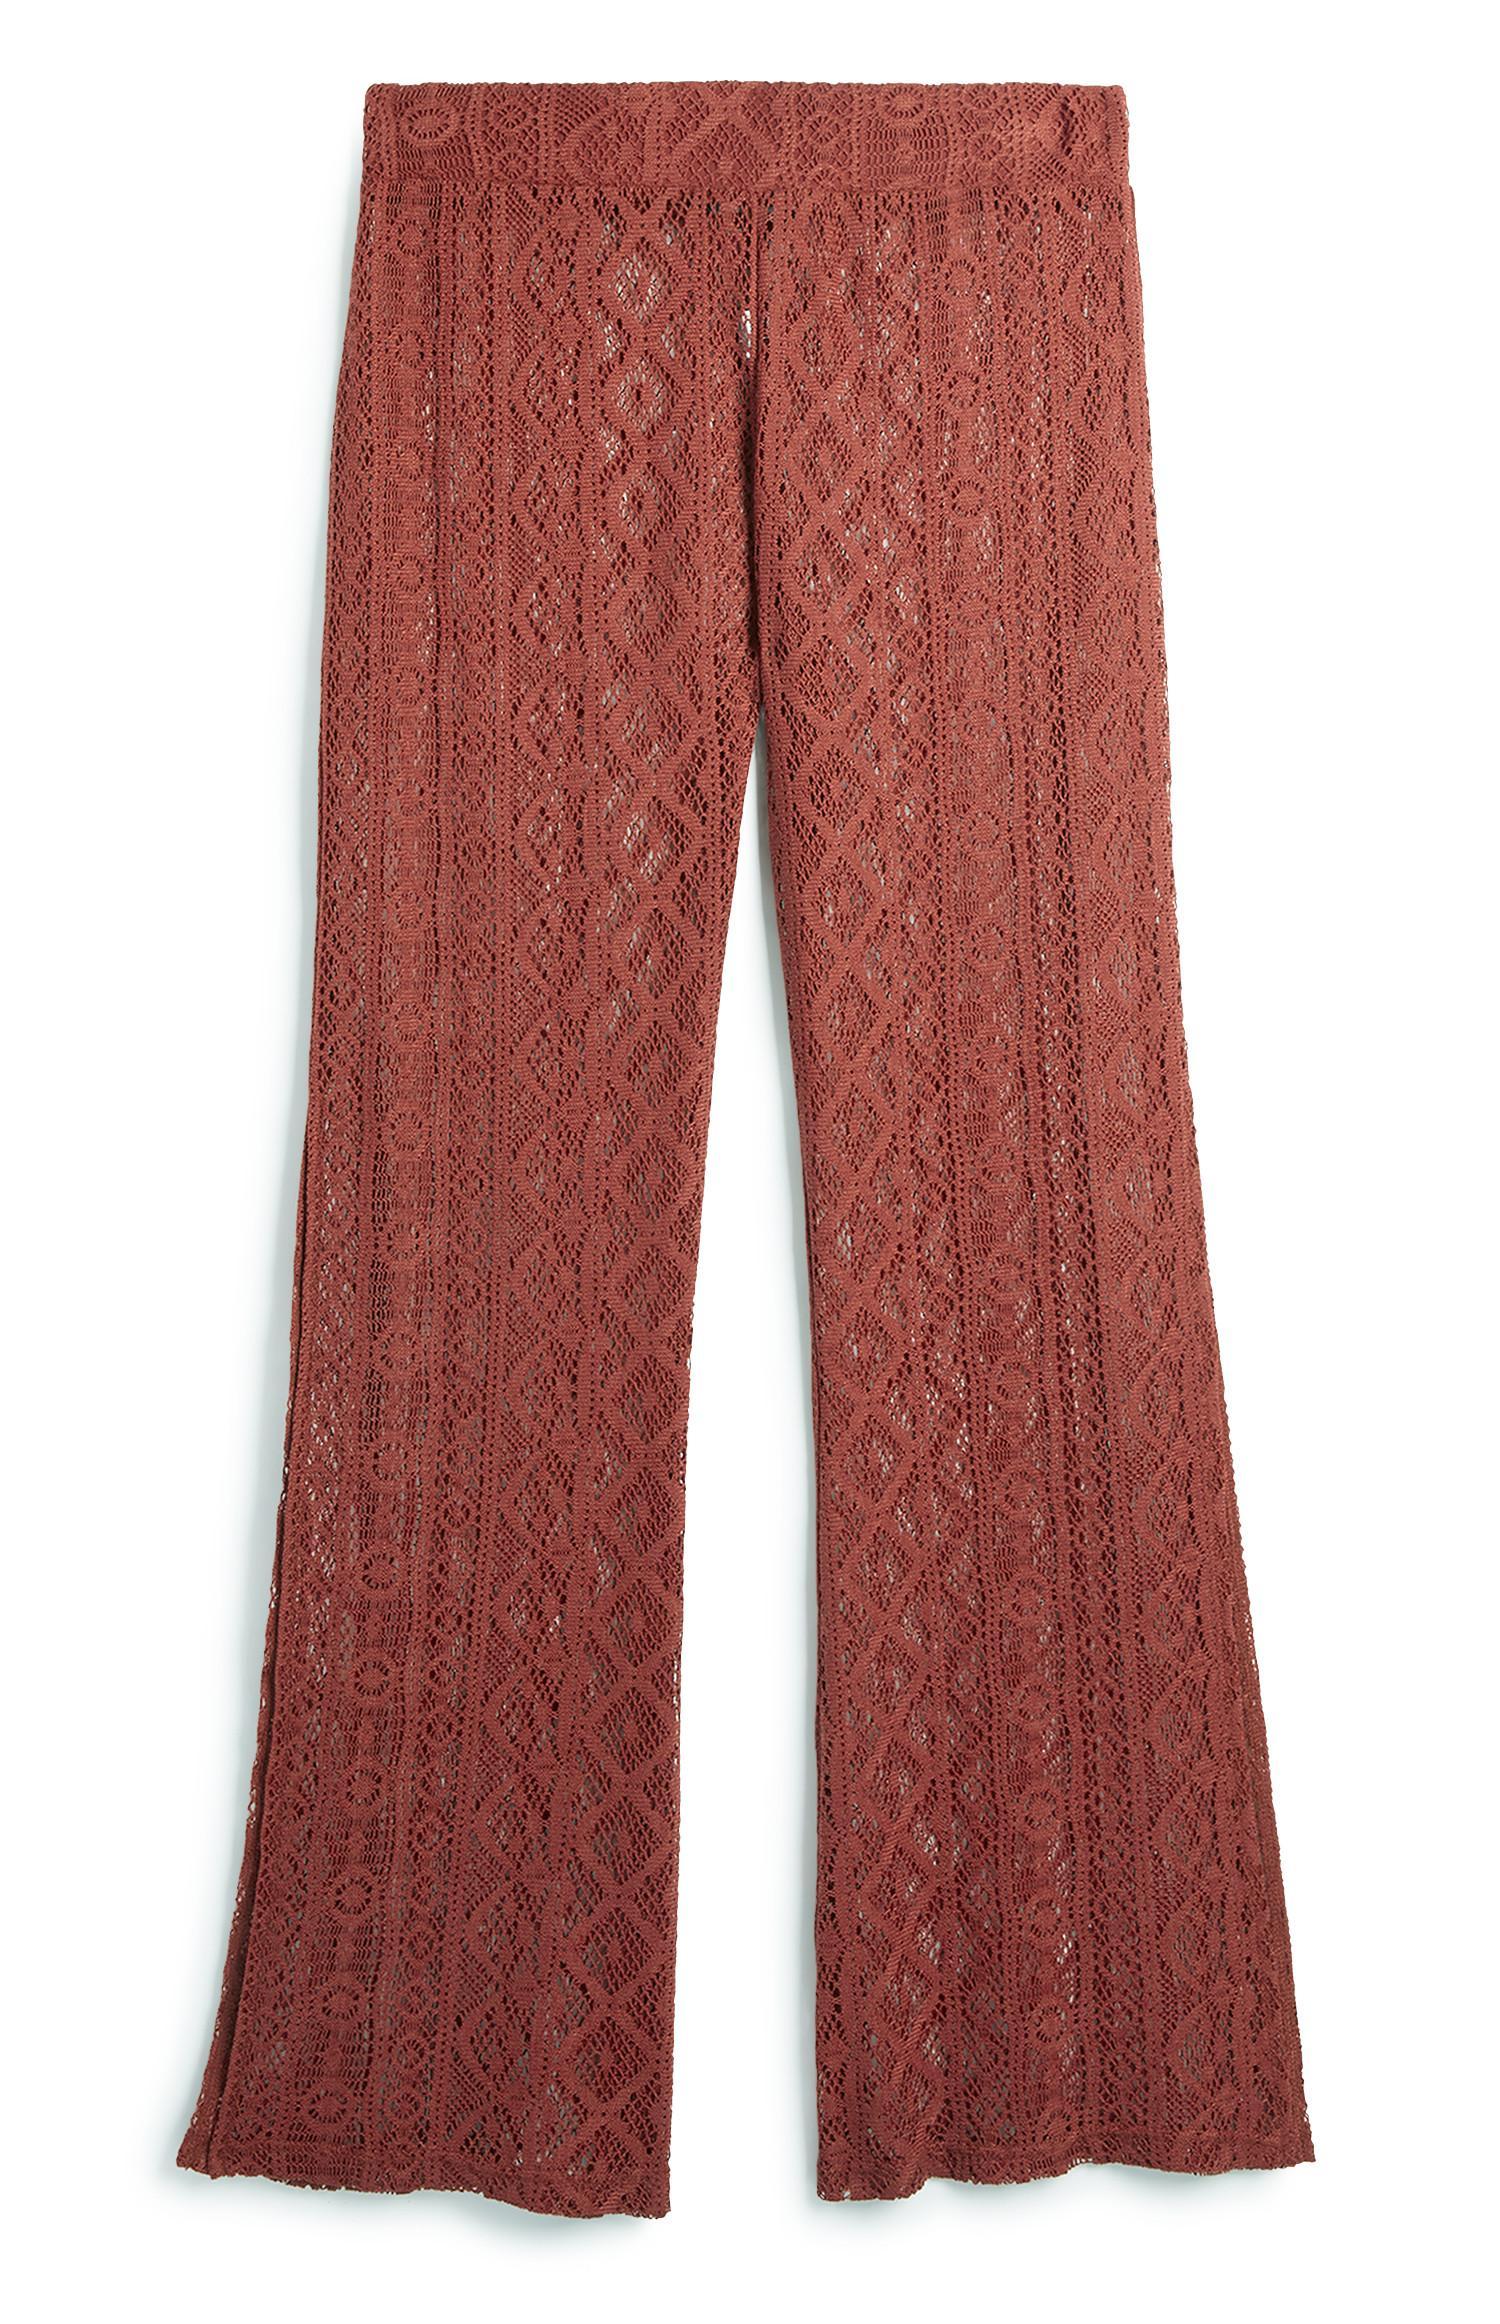 Terracotta Lace Trouser